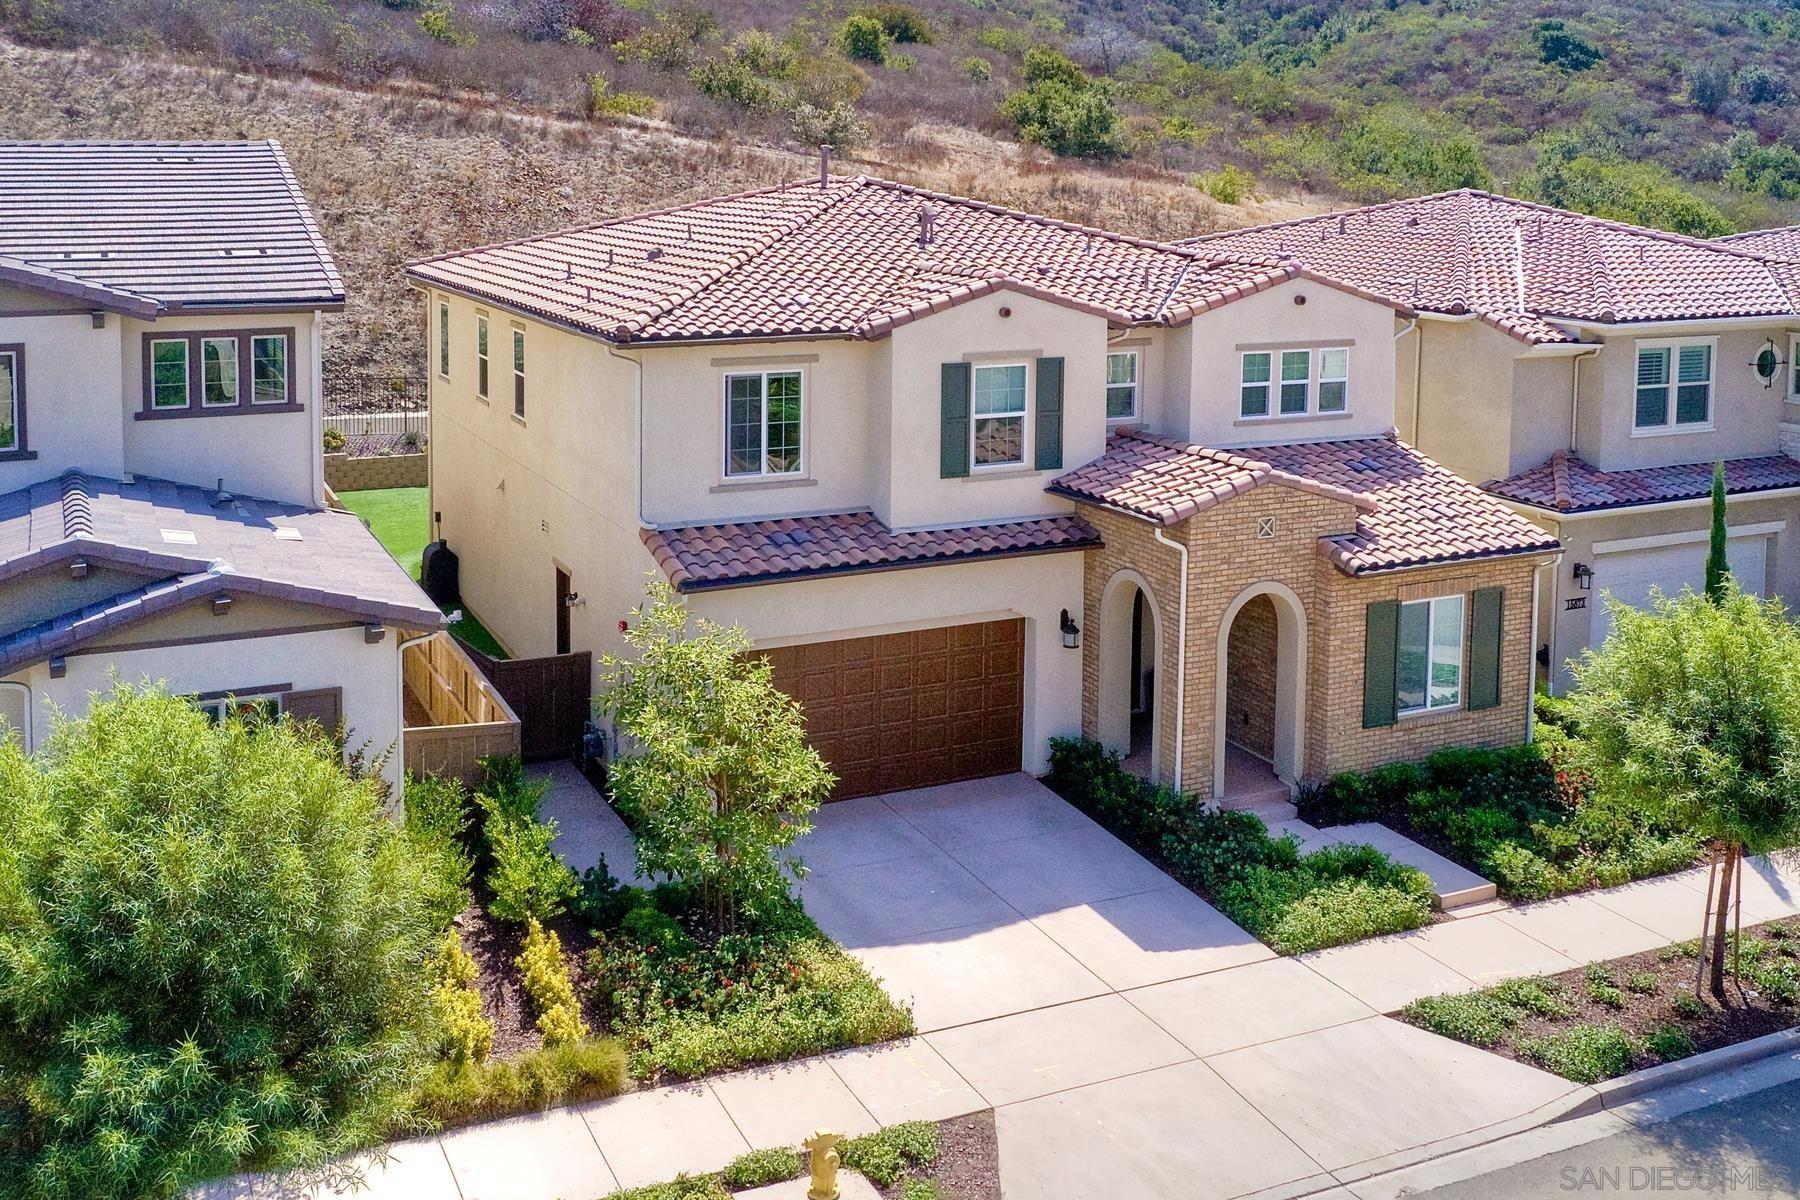 Photo of 15877 Winecreek Drive, San Diego, CA 92127 (MLS # 210028265)